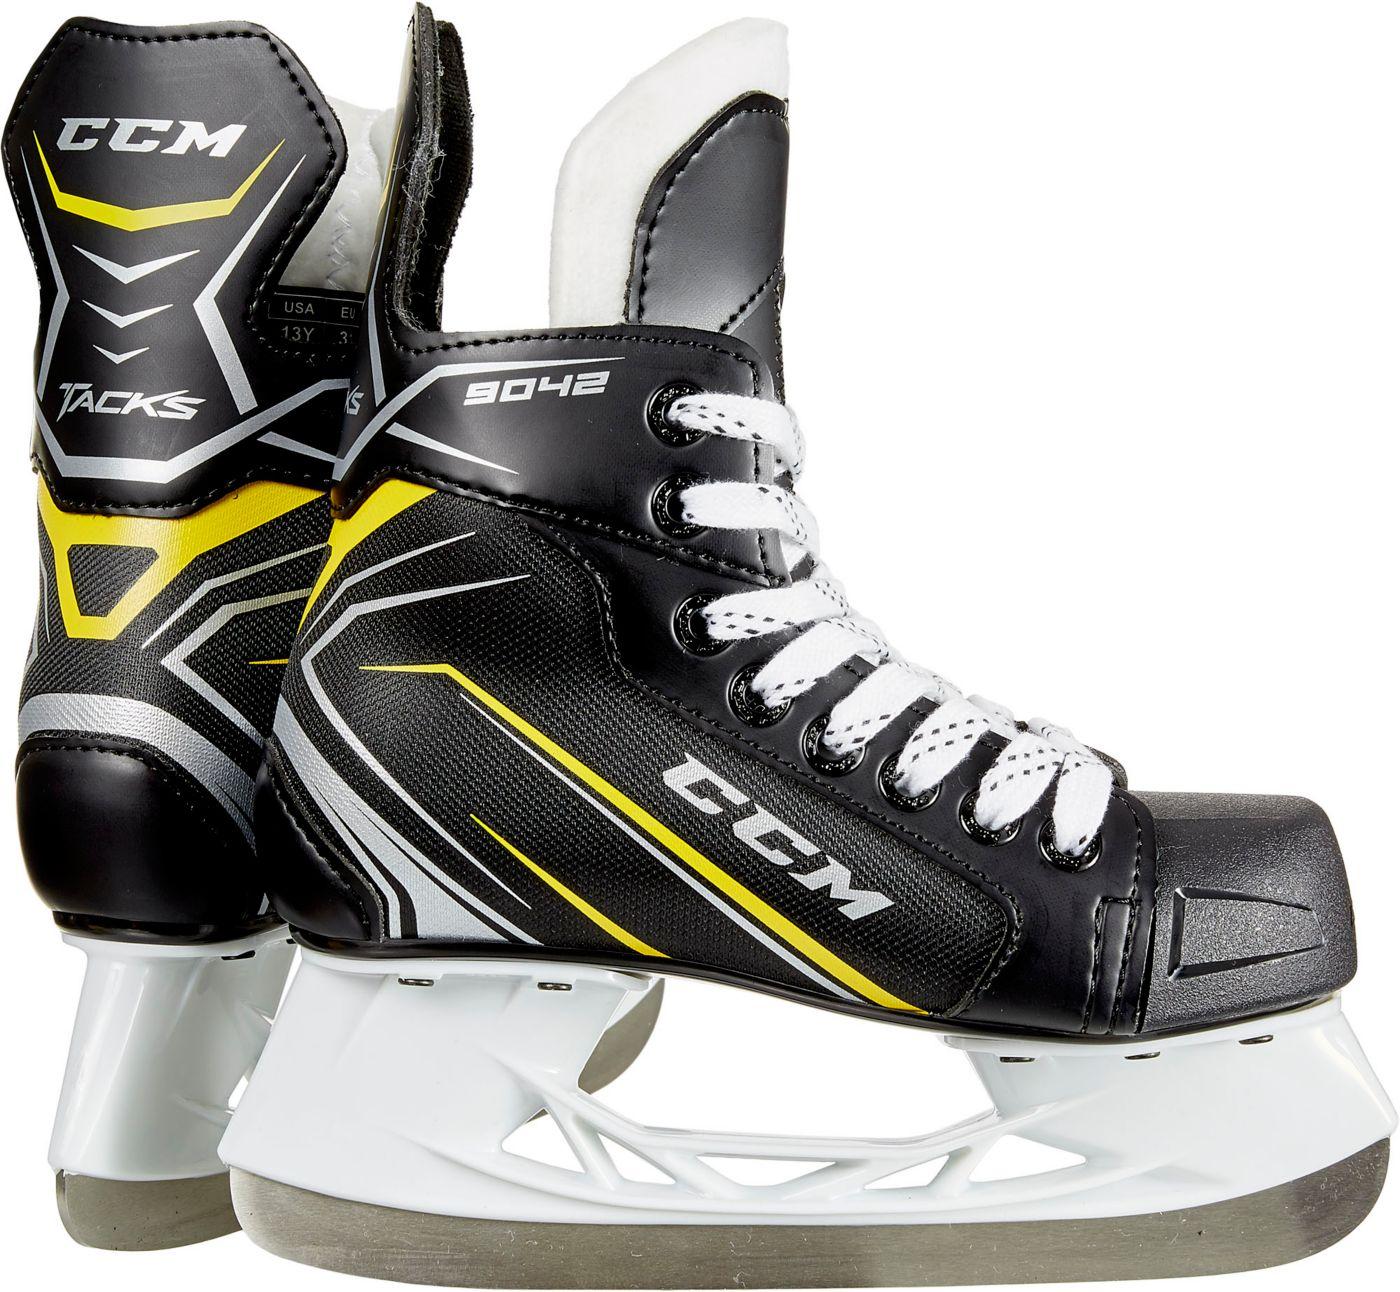 CCM Youth Tacks 9042 Ice Hockey Skates